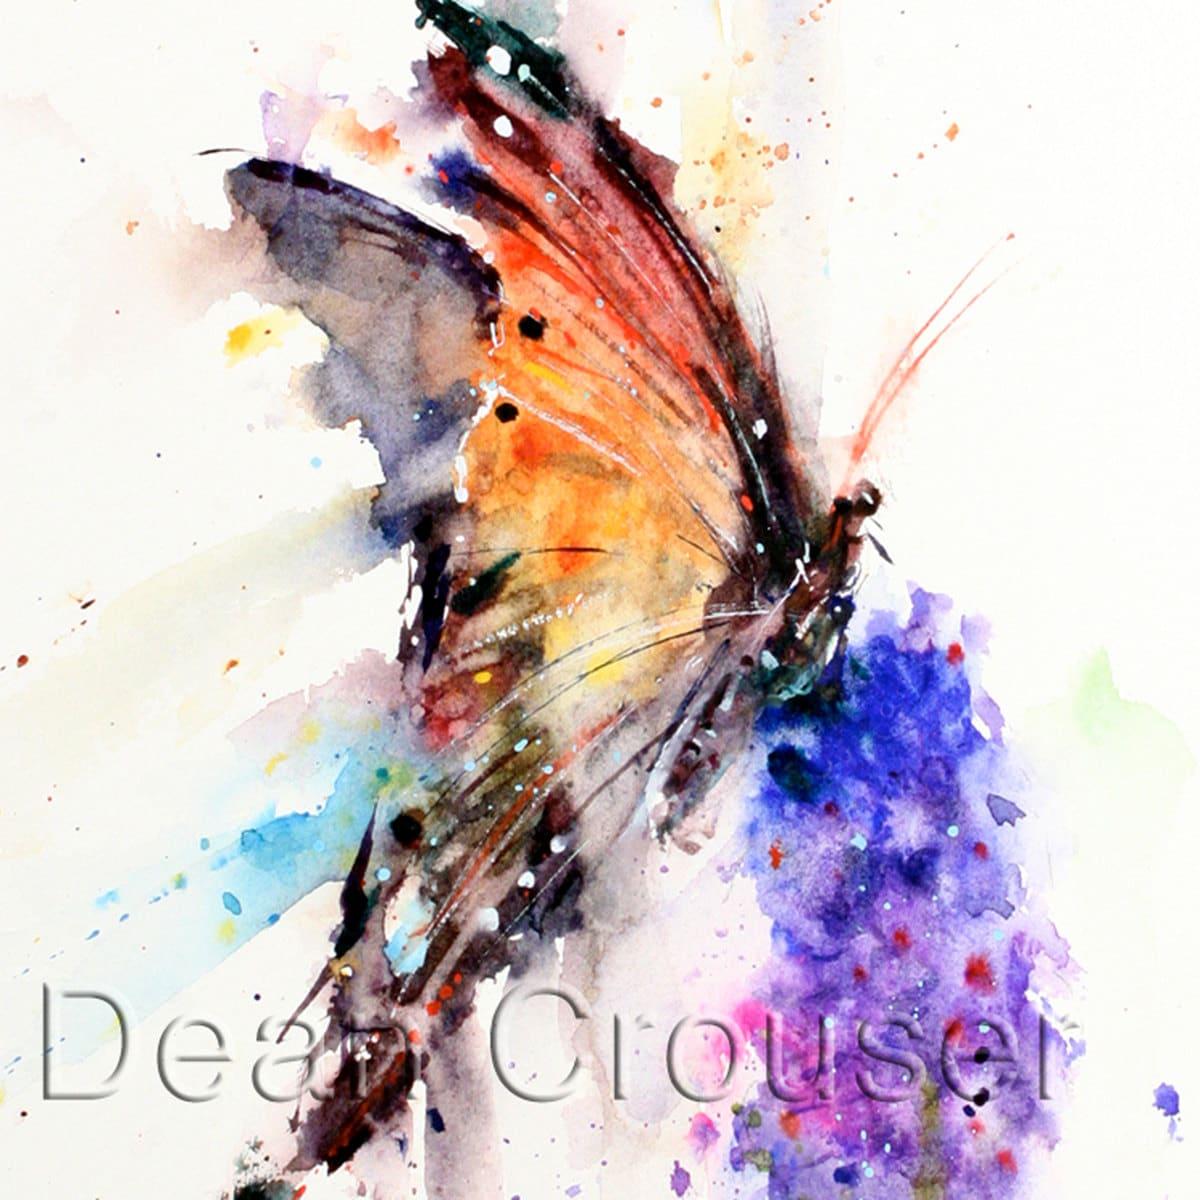 BUTTERFLY & FLOWER Watercolor Print by Dean Crouser - photo#46